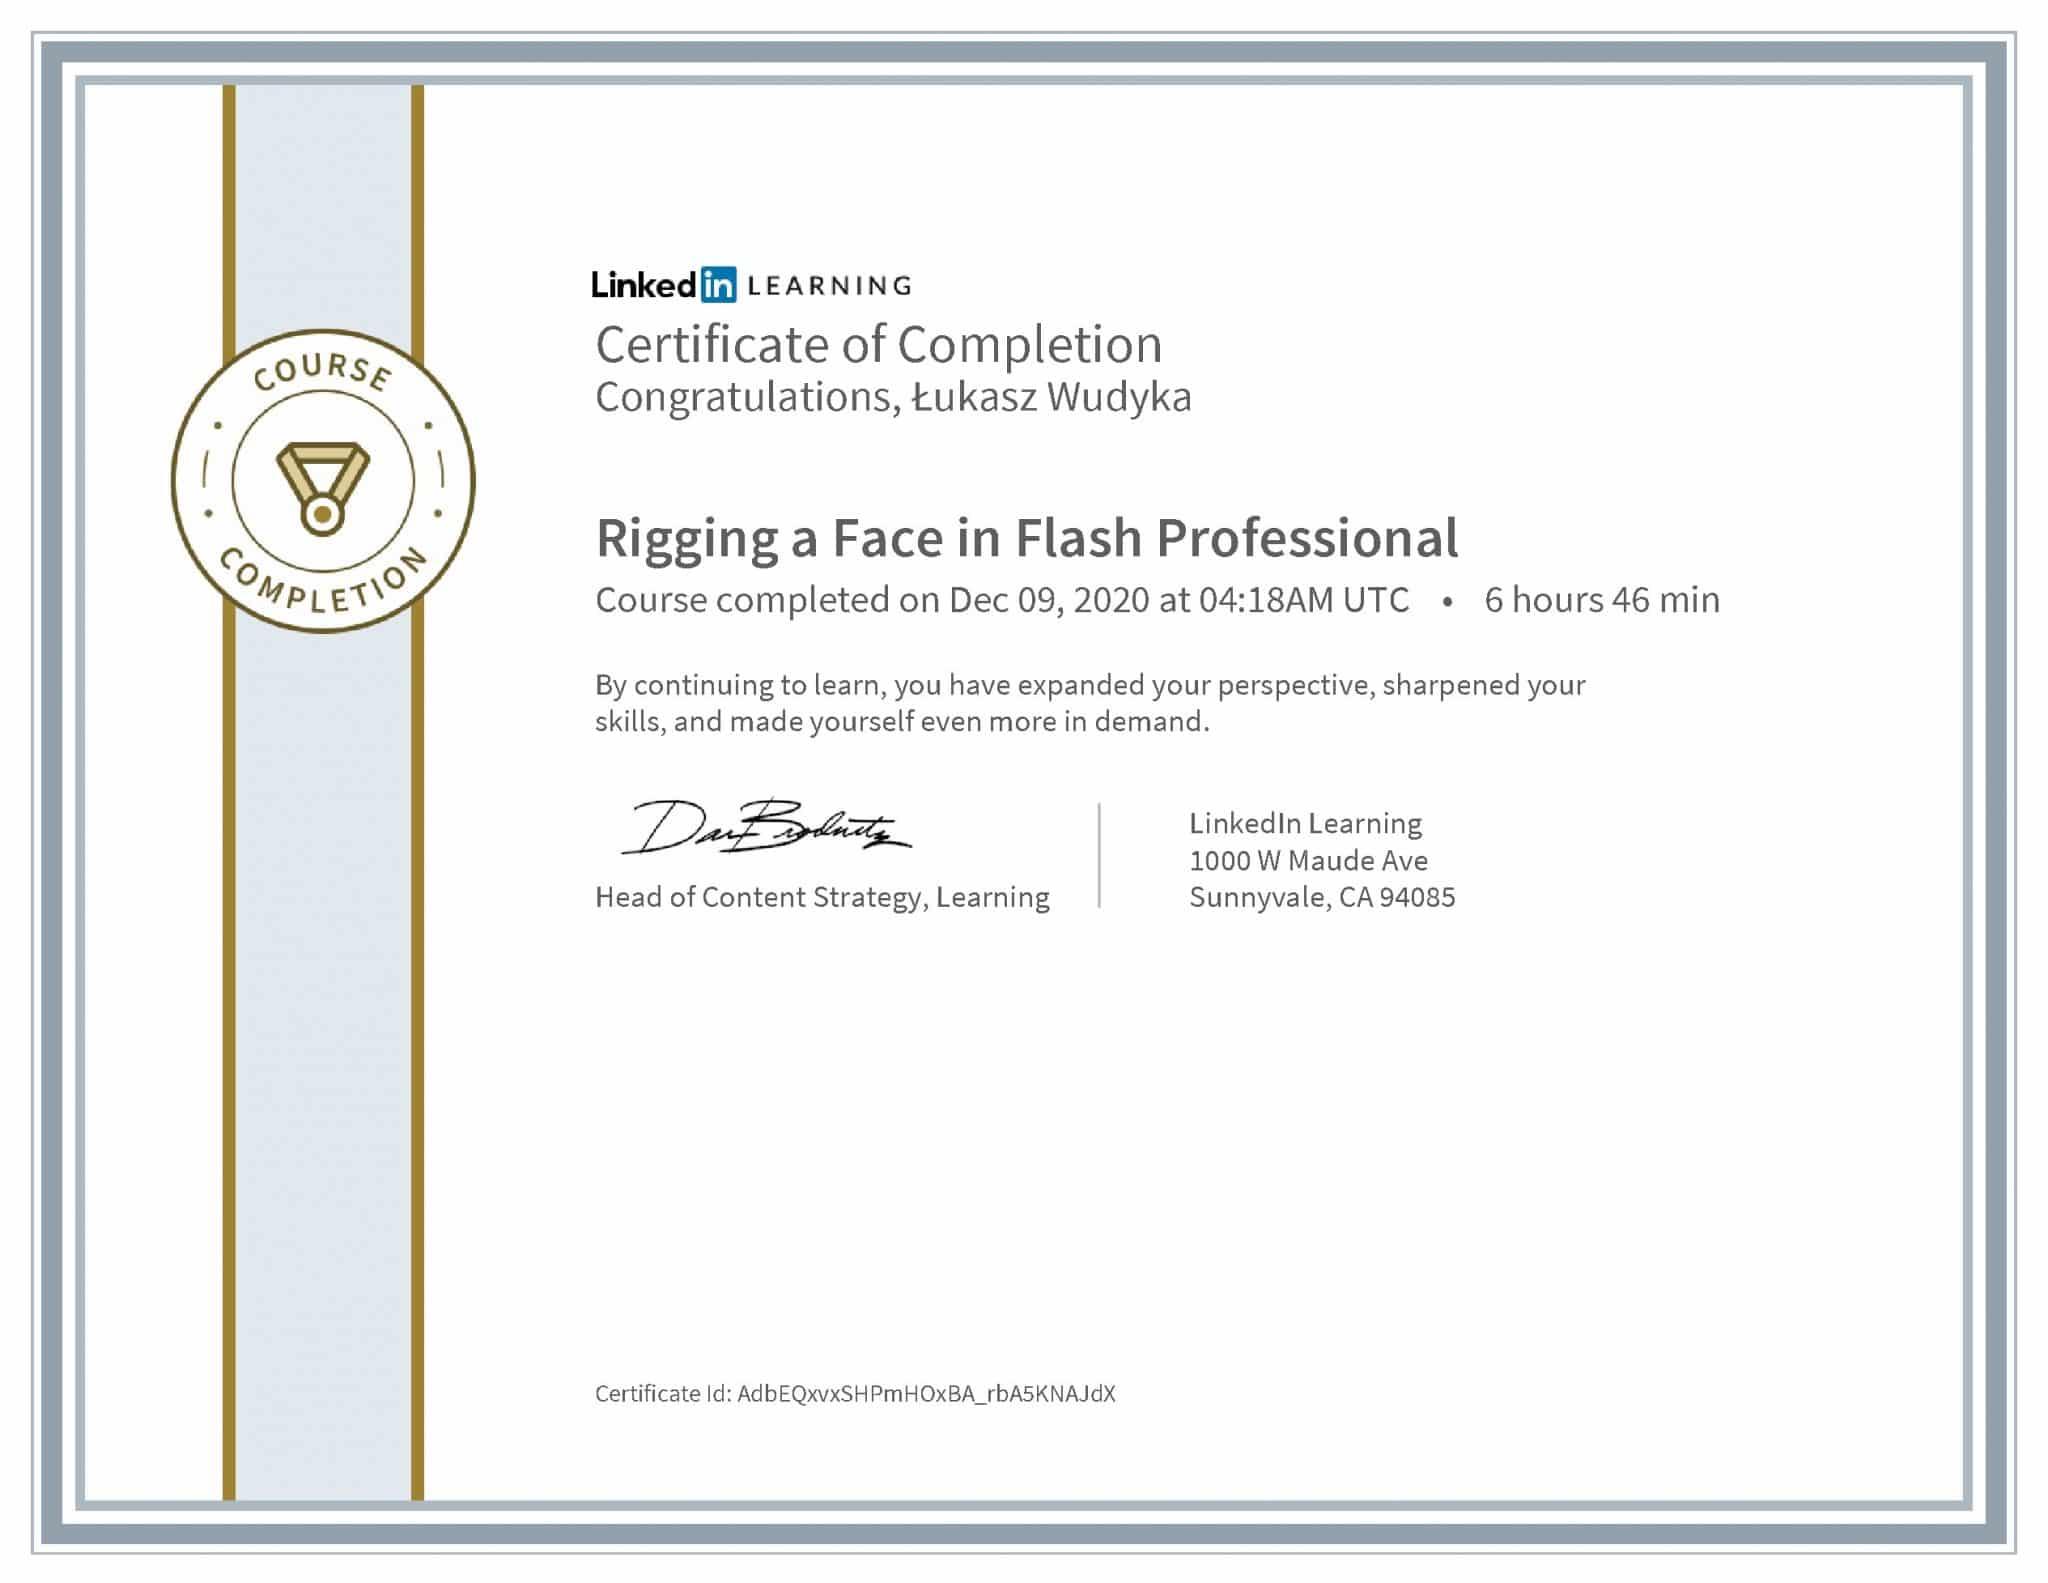 Łukasz Wudyka certyfikat LinkedIn Rigging a Face in Flash Professional